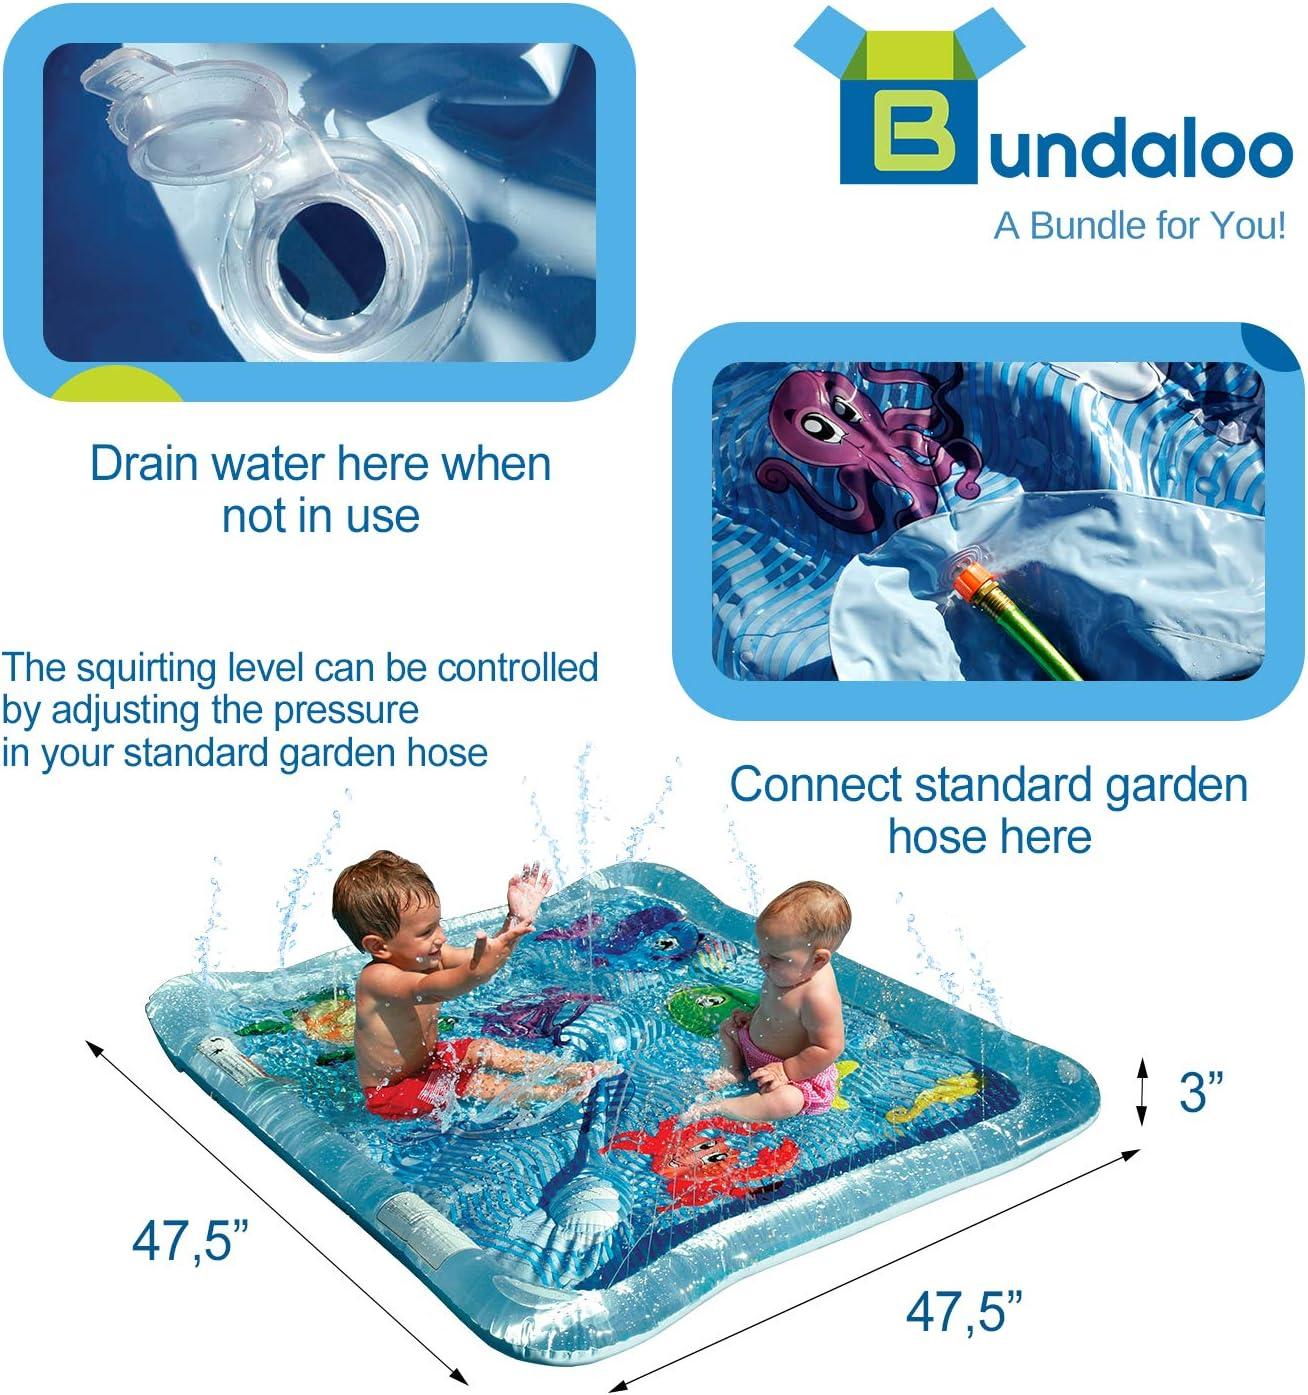 Amazon.com: Bundaloo - Piscina inflable para bebé, para uso ...